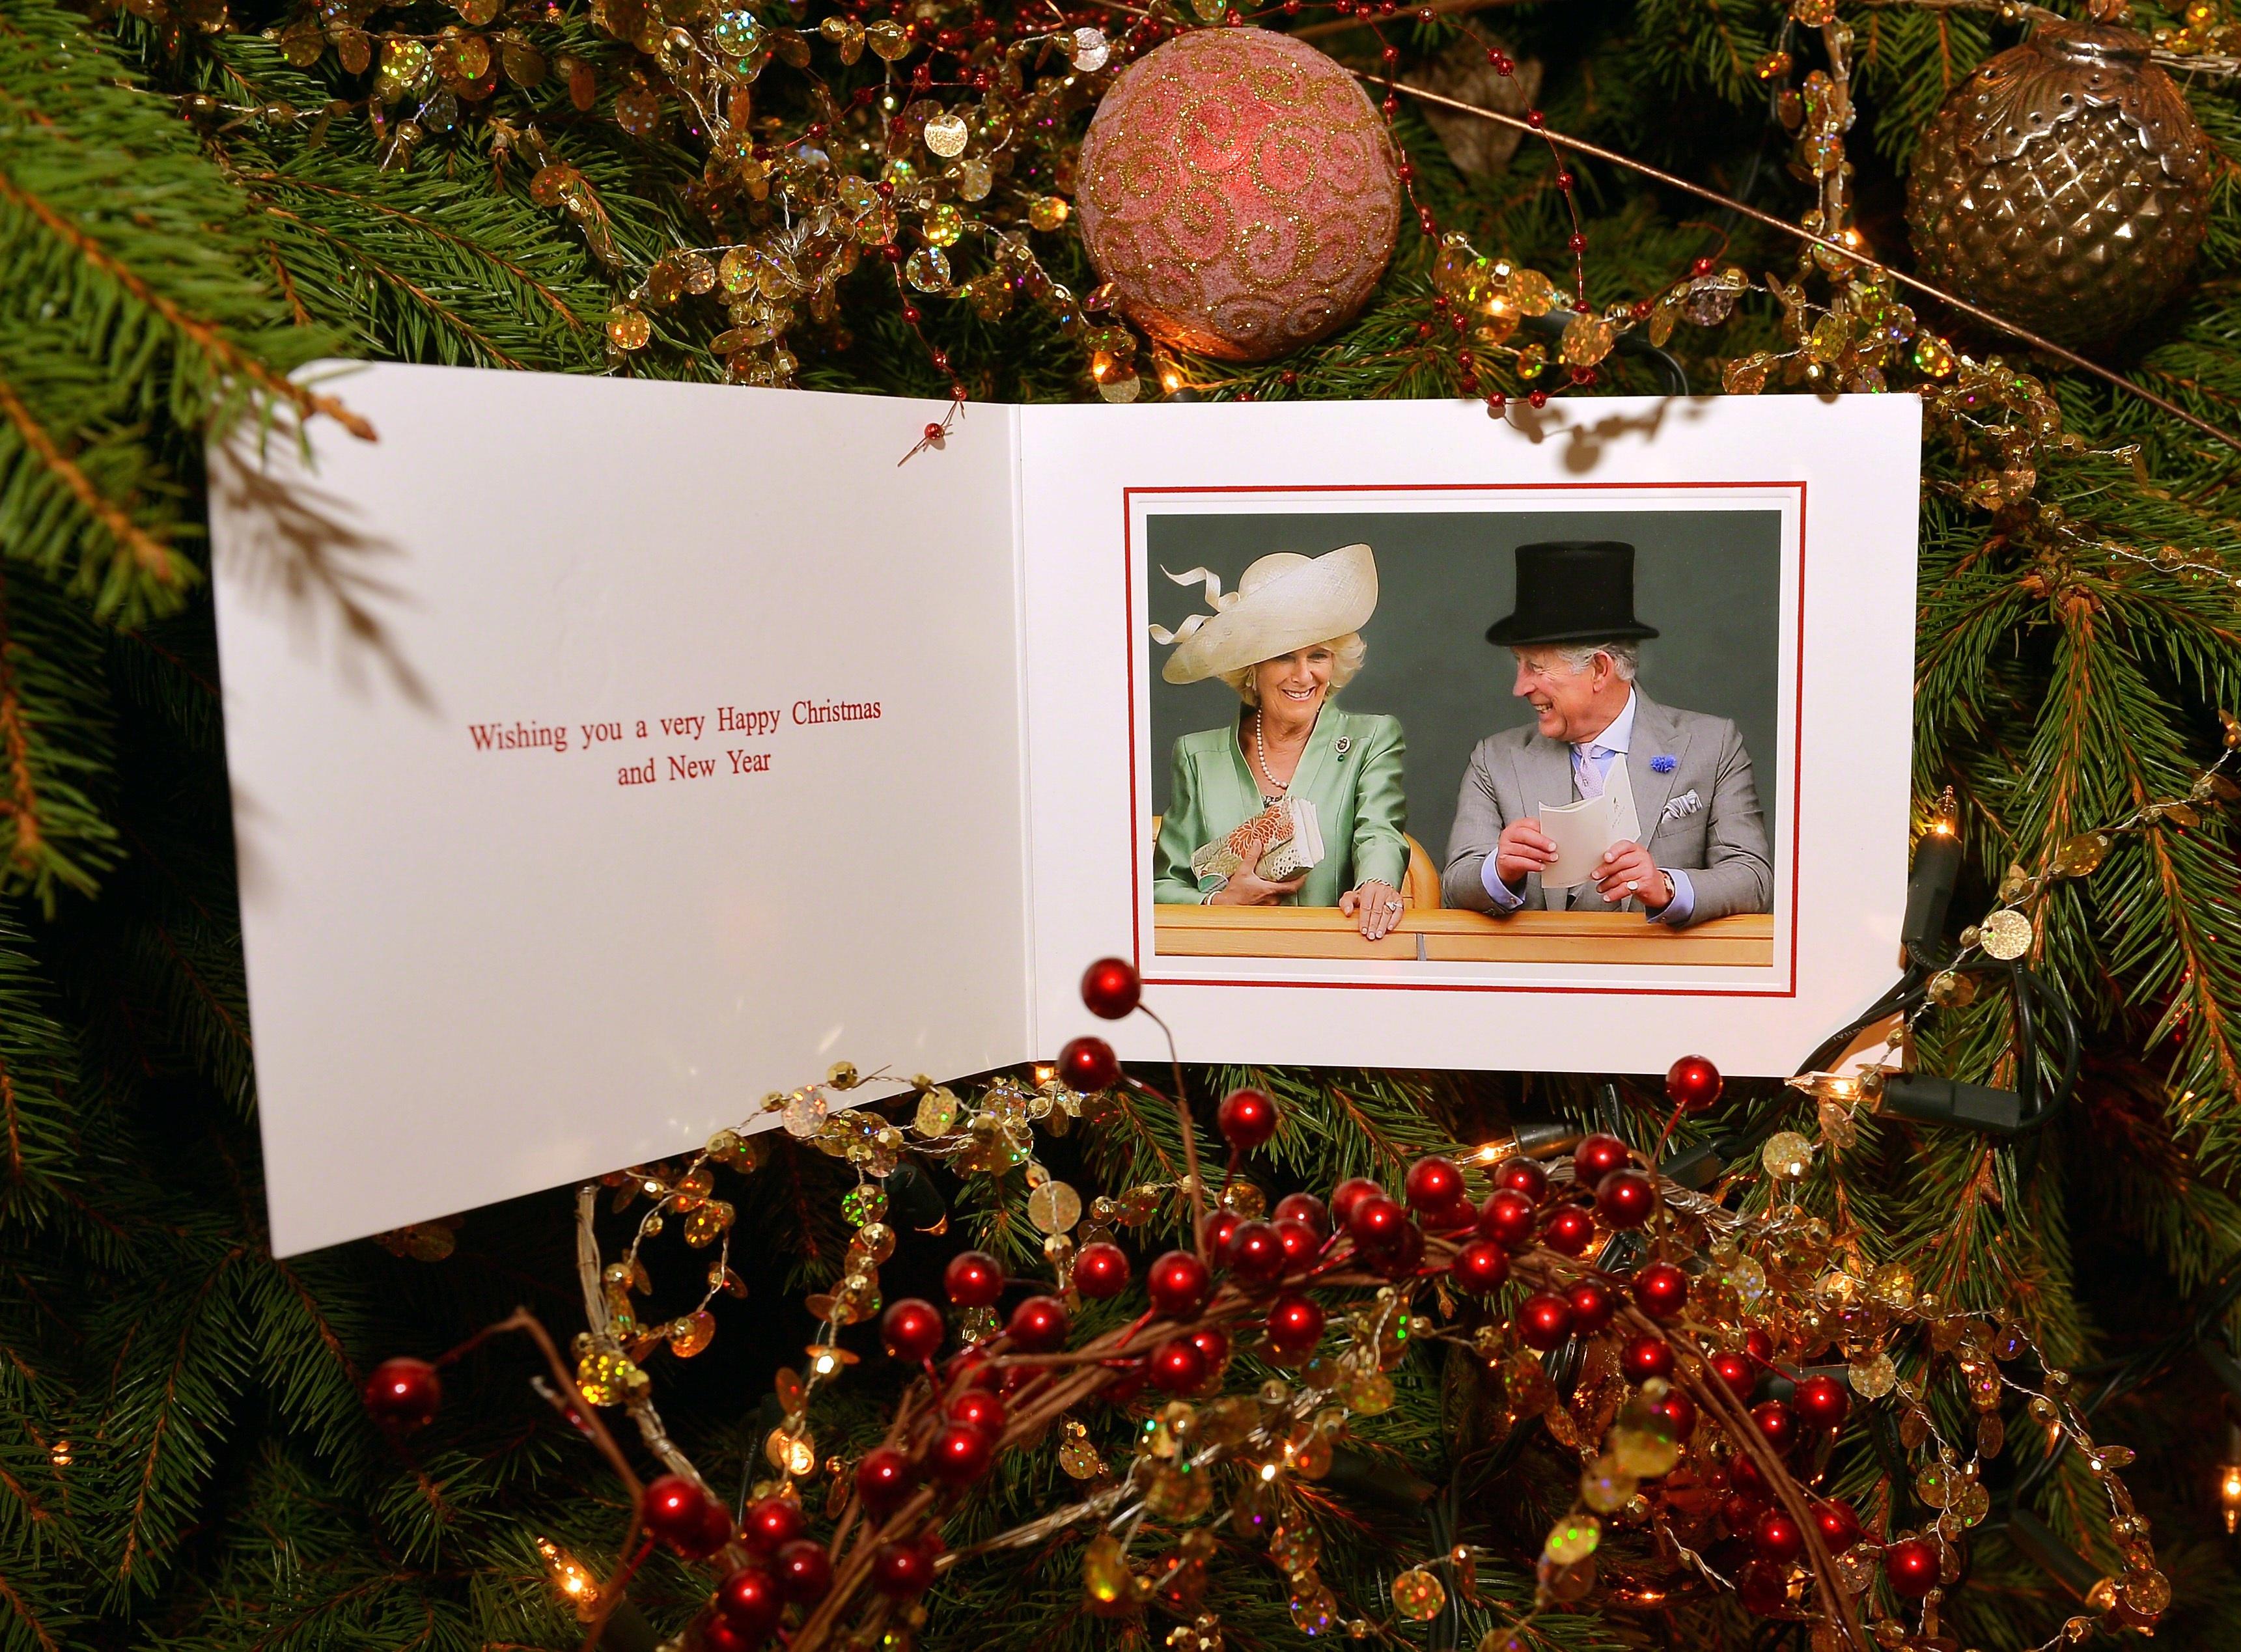 Prince Charles Camilla Christmas card